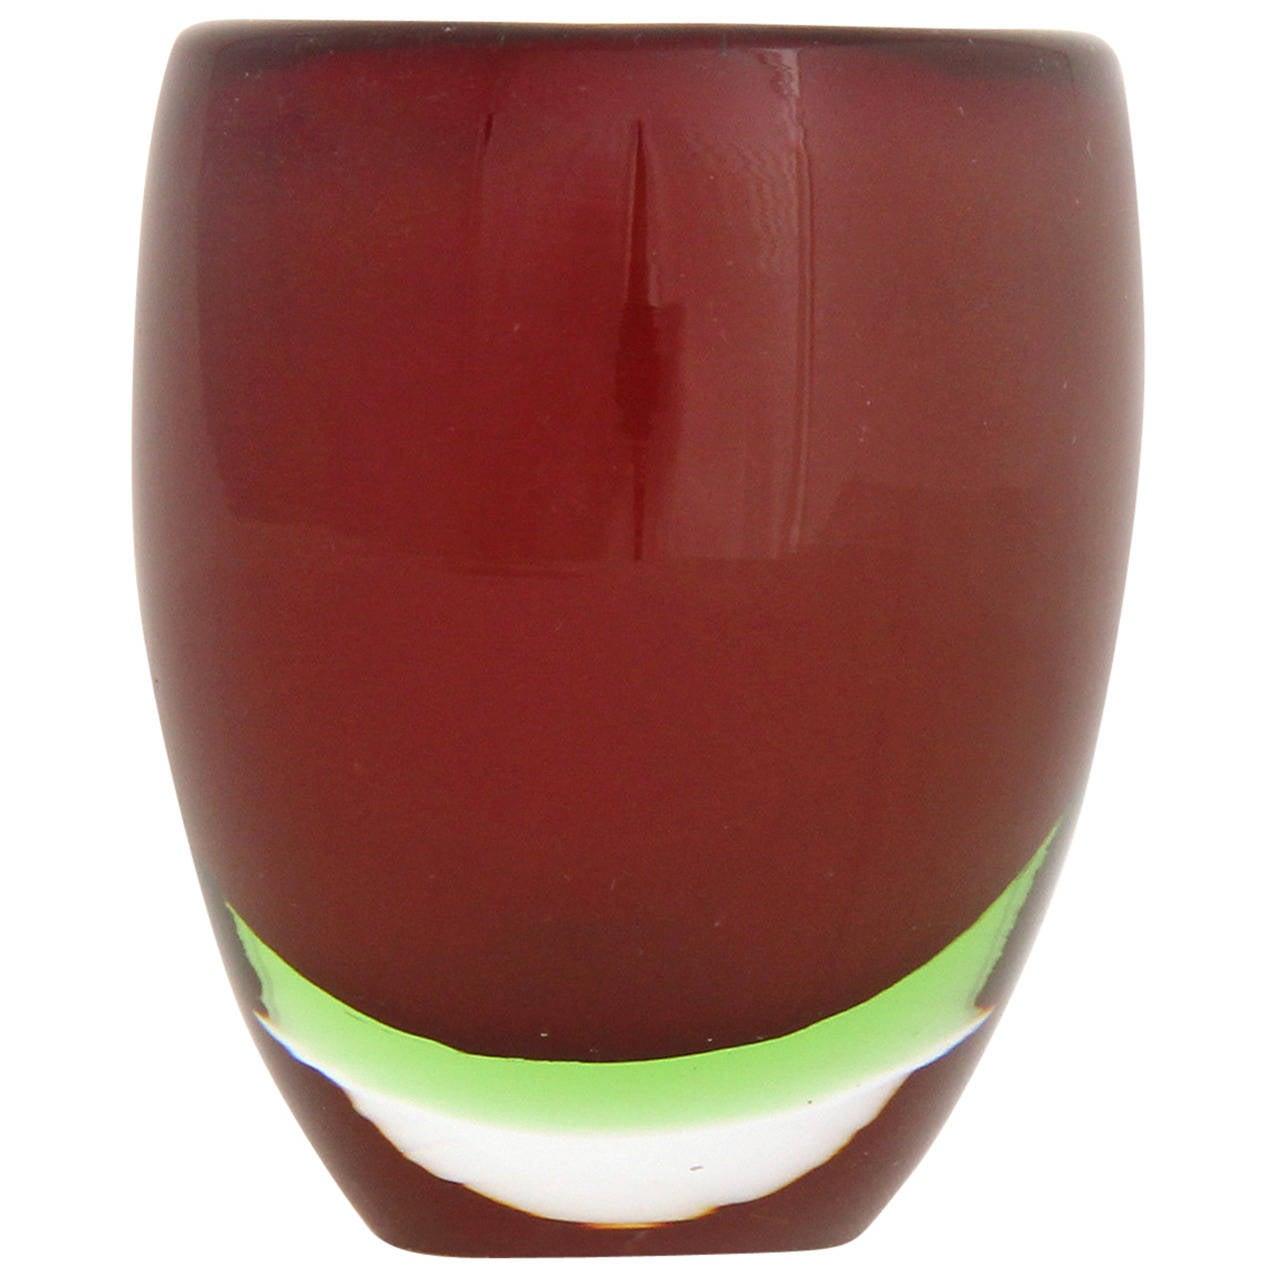 Petite Sommerso Vase by Tapio Wirkkala